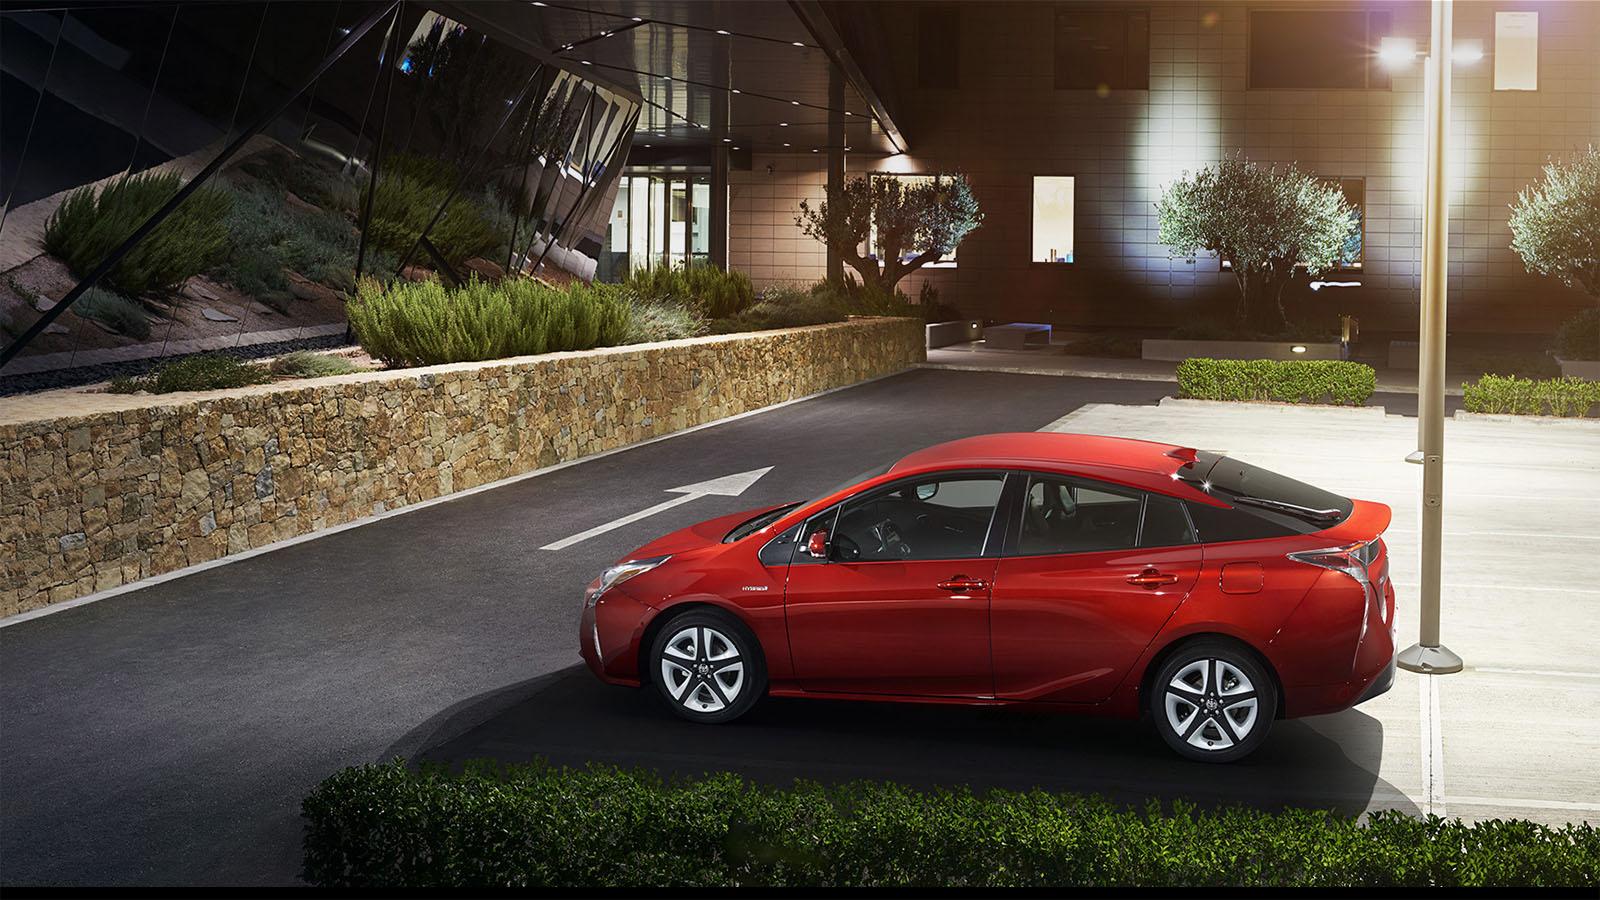 Hybride Toyota Volgens Anwb Zuinigste Benzine Auto Toyota